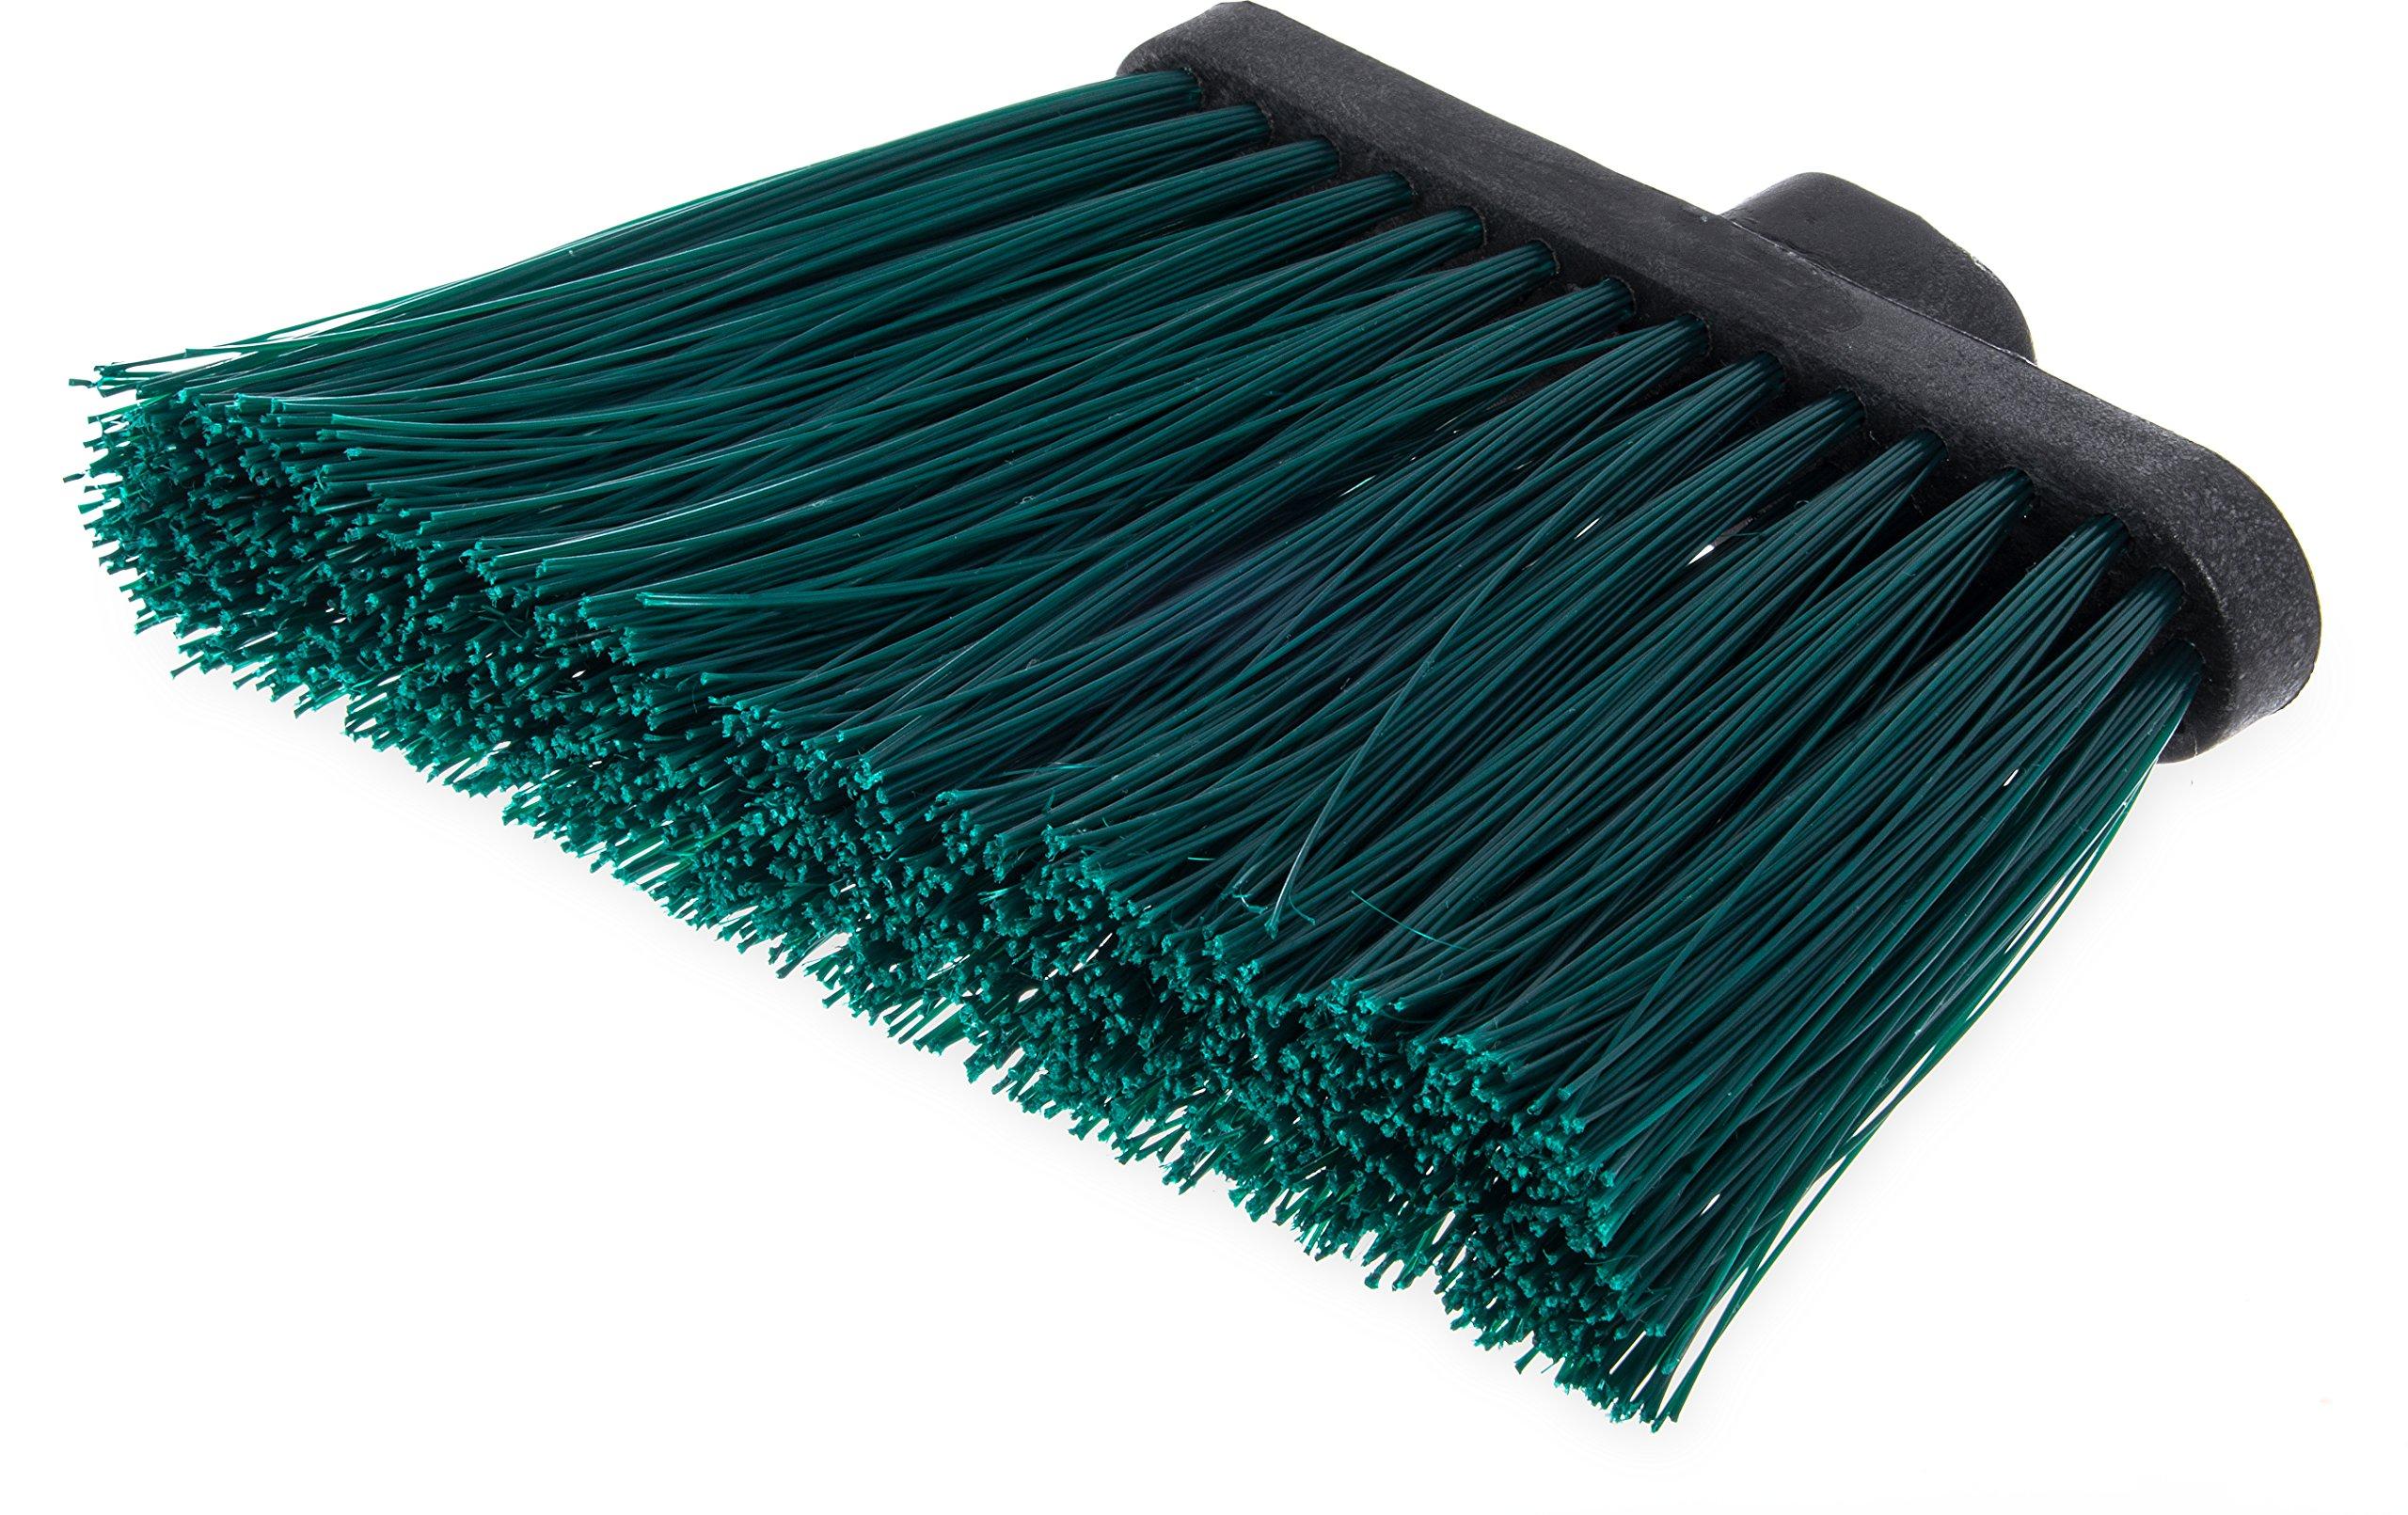 Carlisle 3686809 Duo-Sweep UnFlagged Angle Broom Head, 8'', Green (Pack of 12)